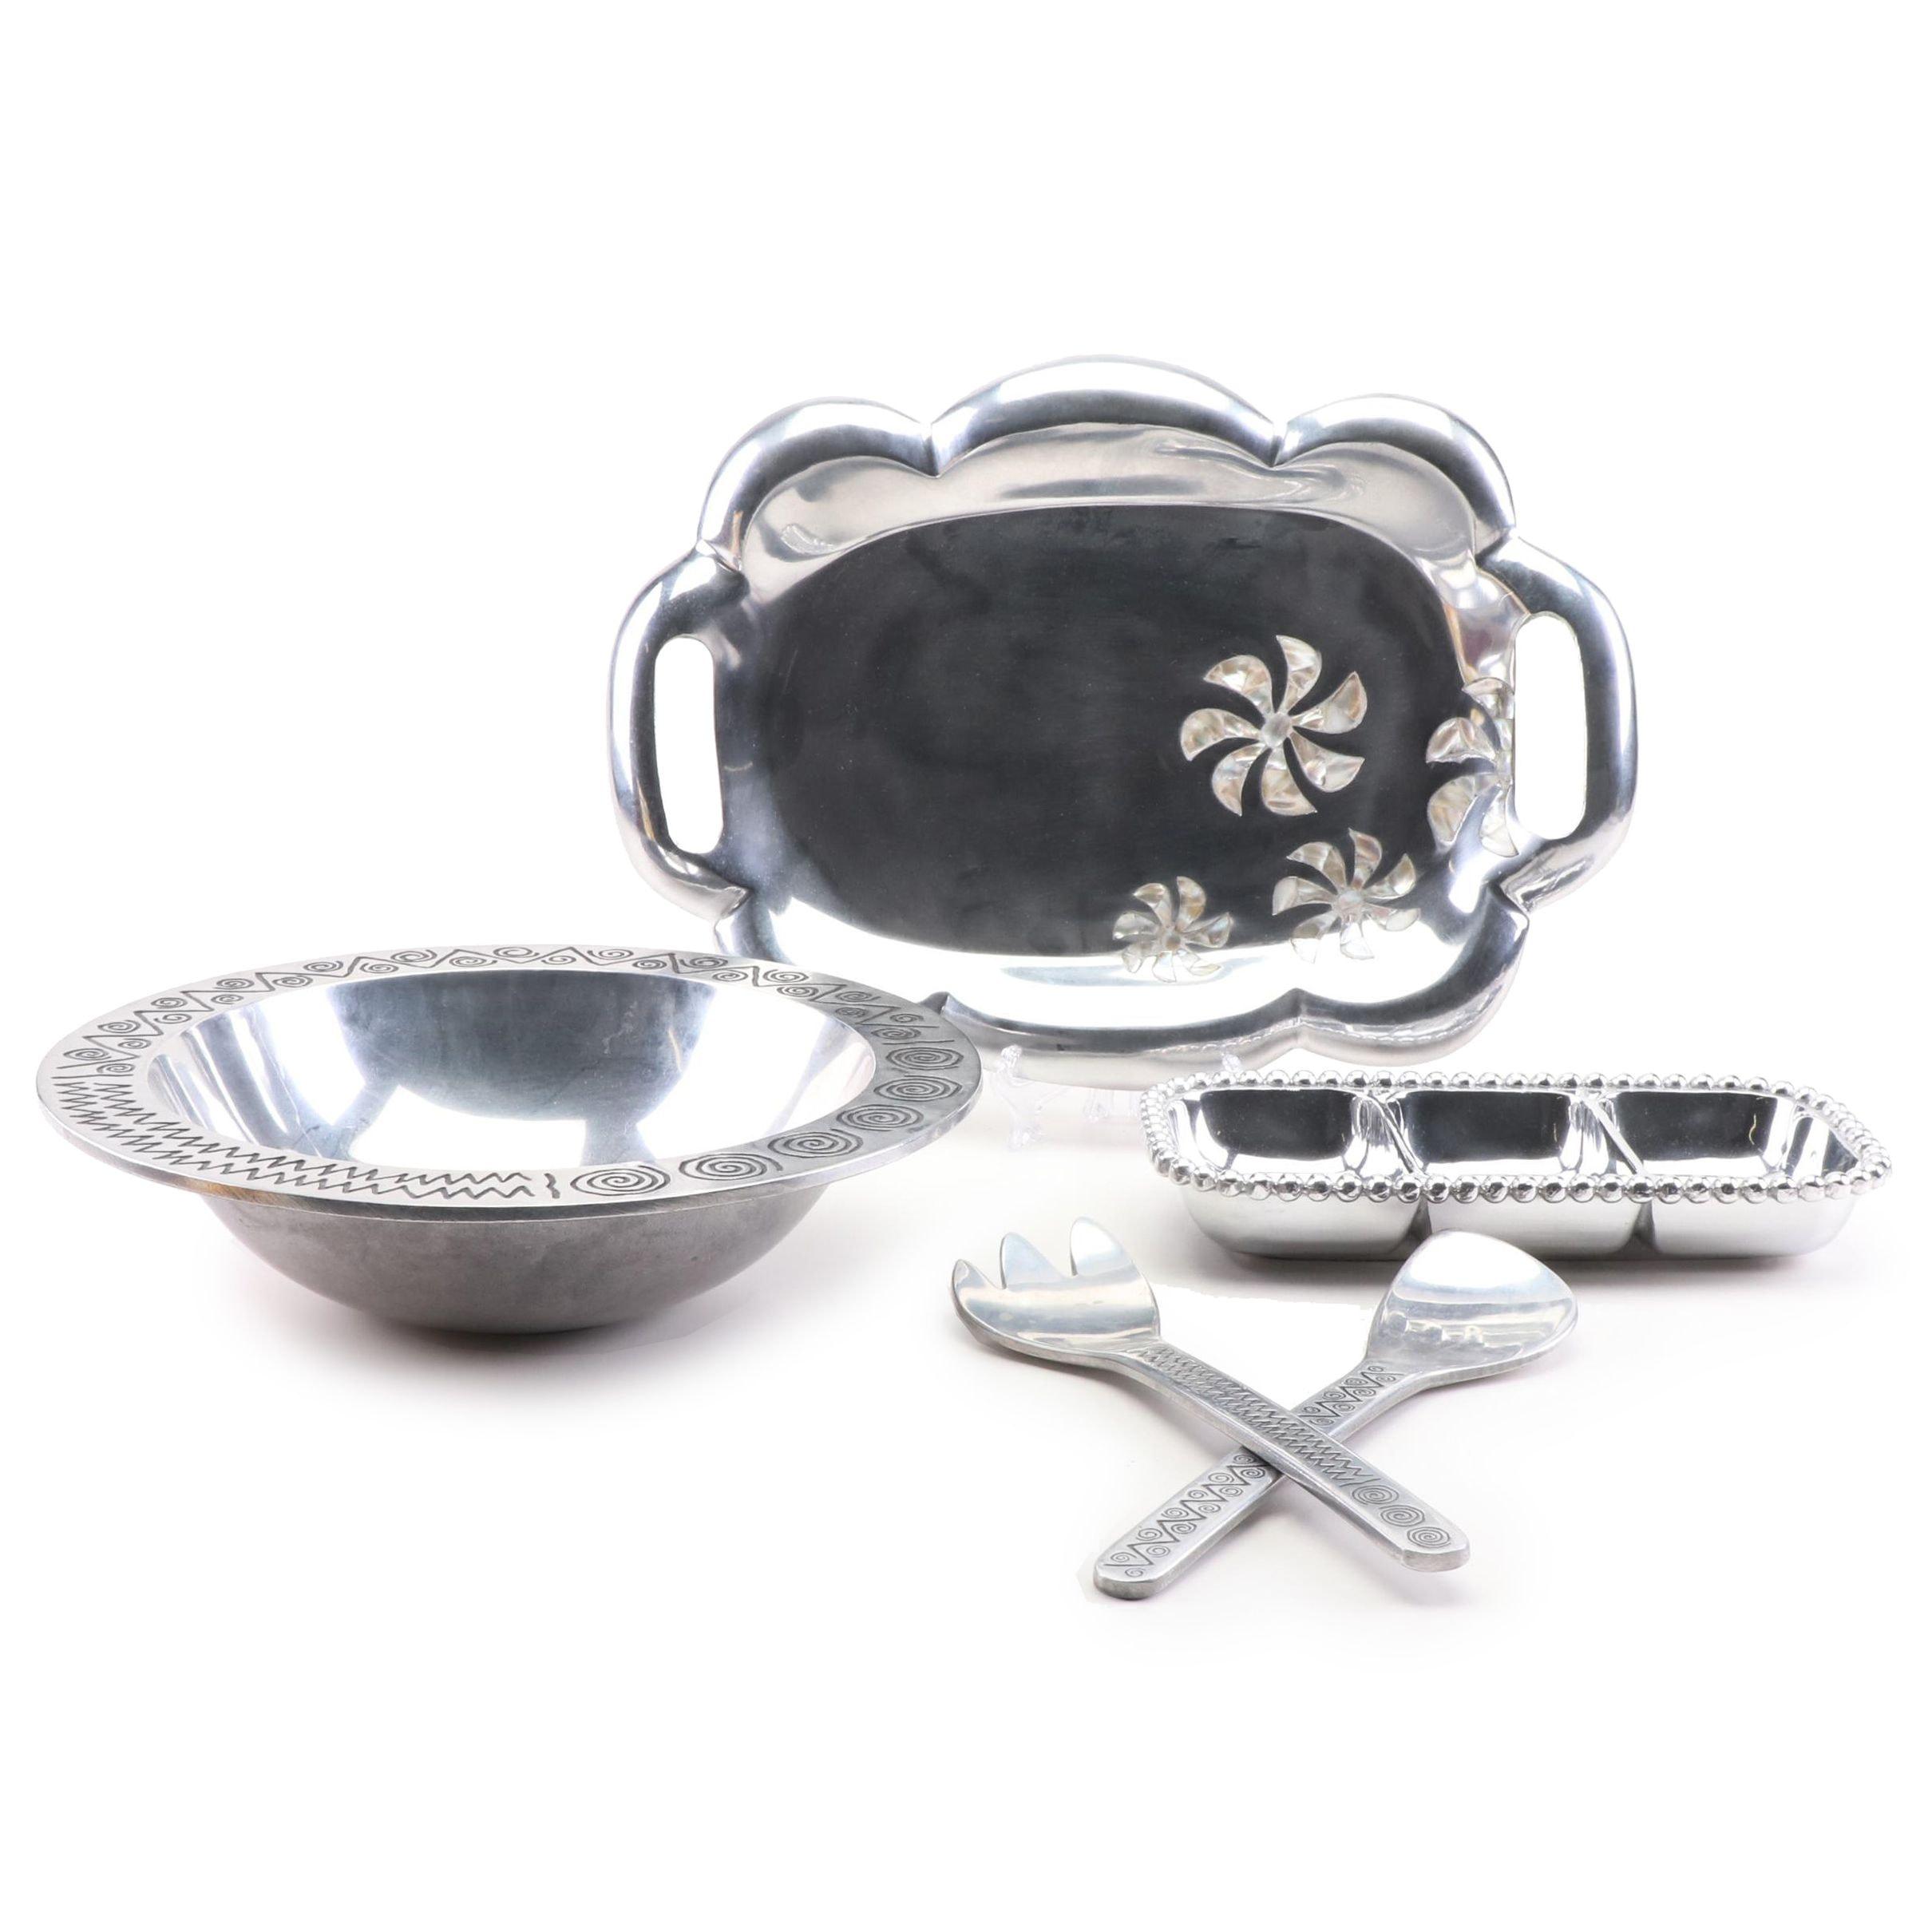 Silver Toned Metal Serveware, Including Mariposa